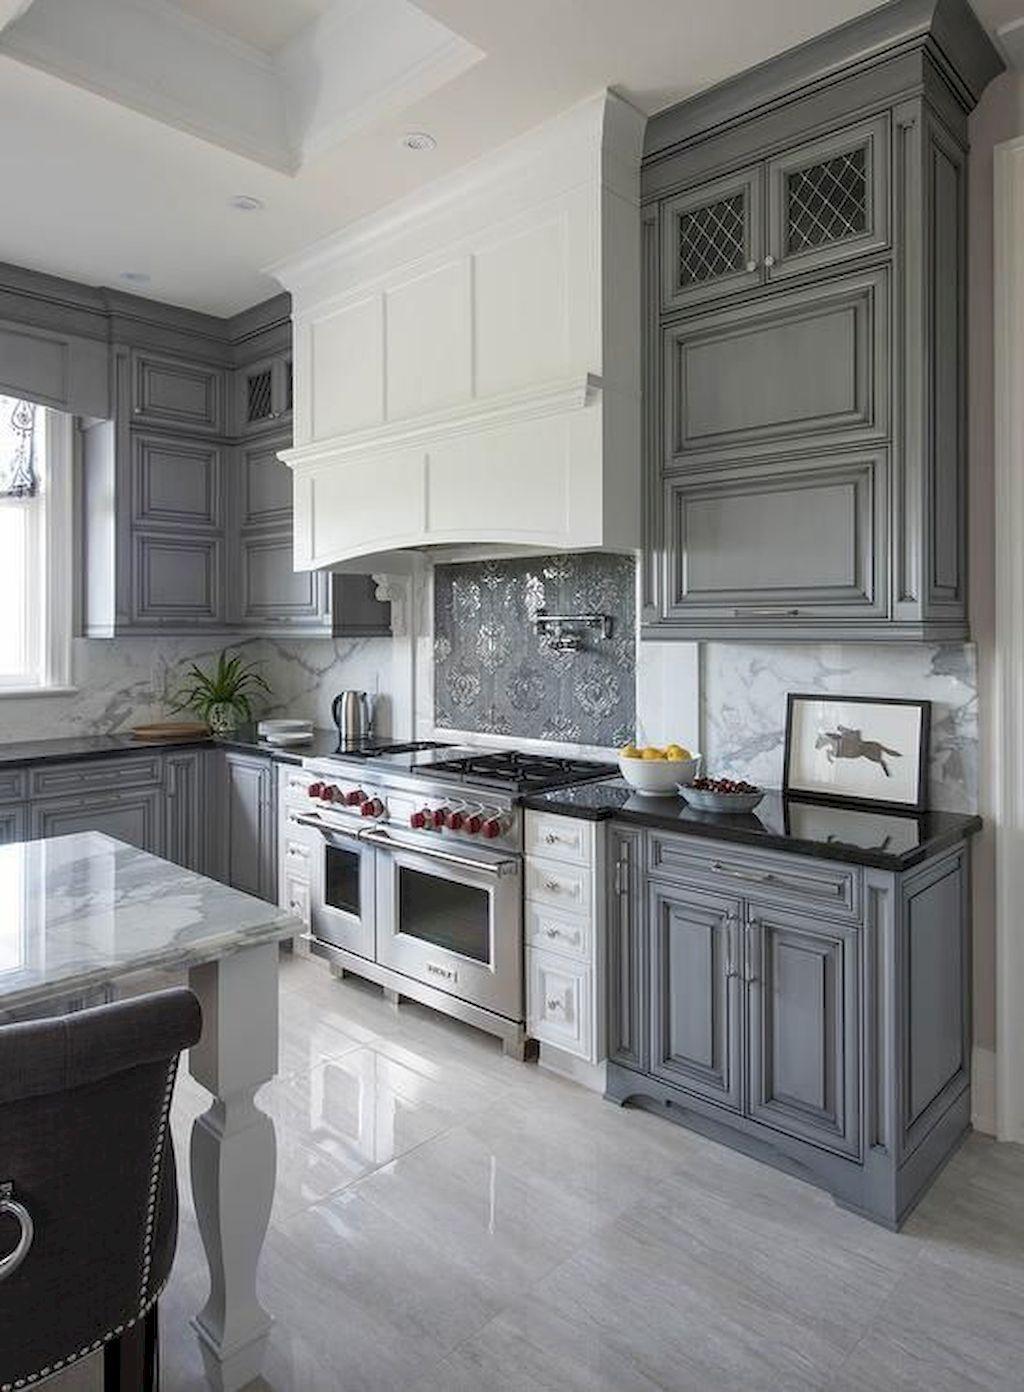 15 awesome gray kitchen cabinet design ideas kitchens pinterest rh pinterest com